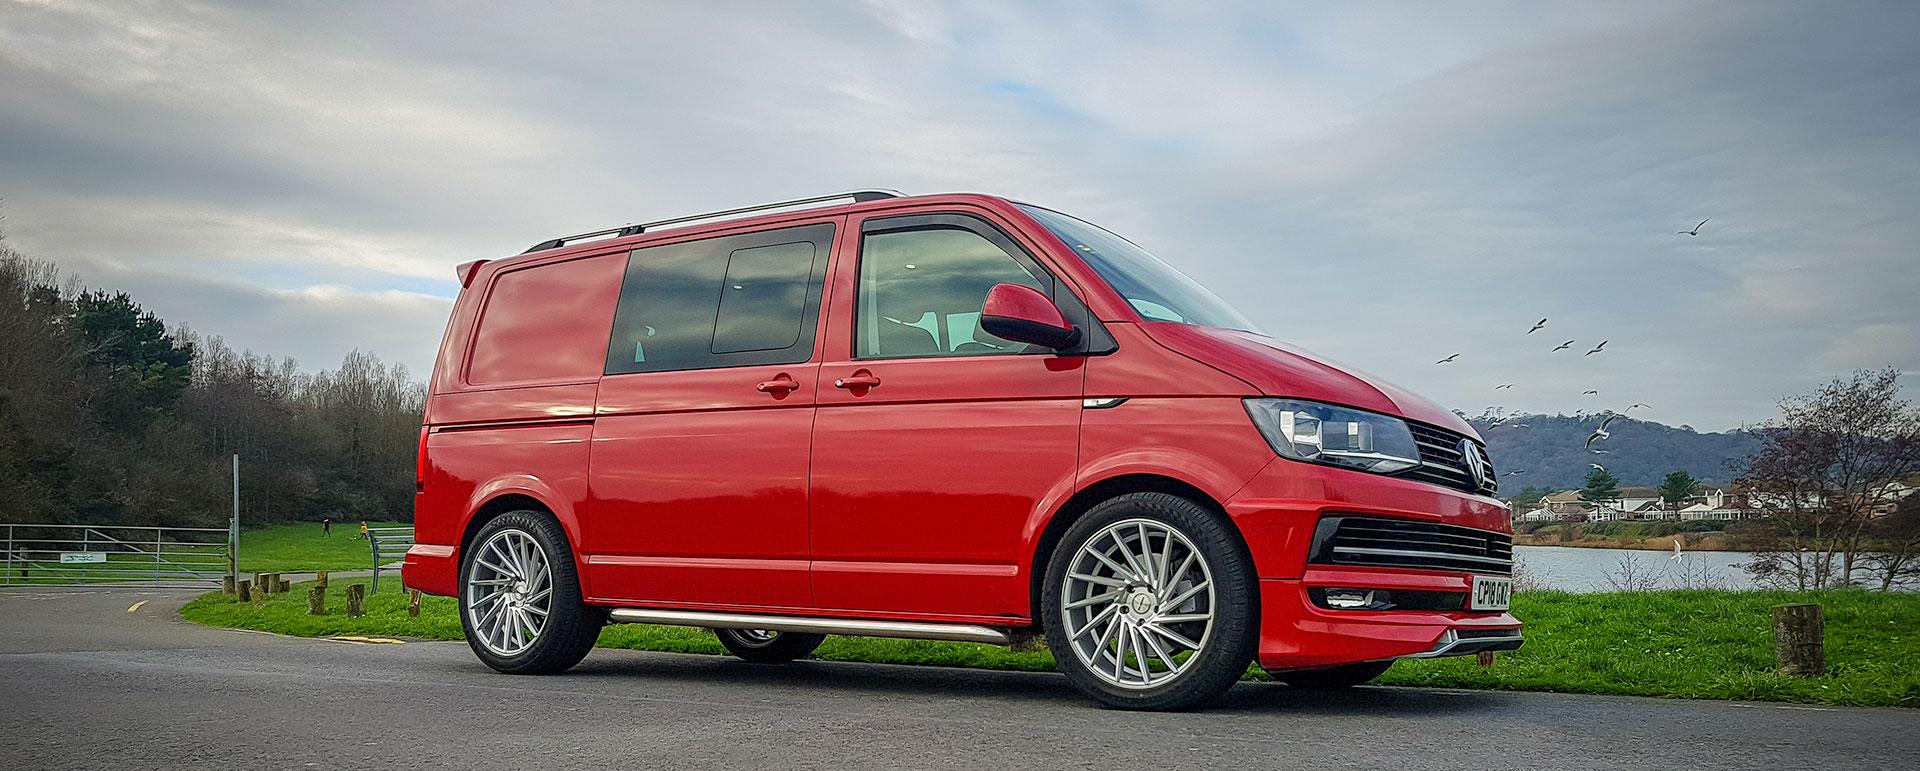 Go Explore VW Kombi Conversion Package - Go Explore Custom